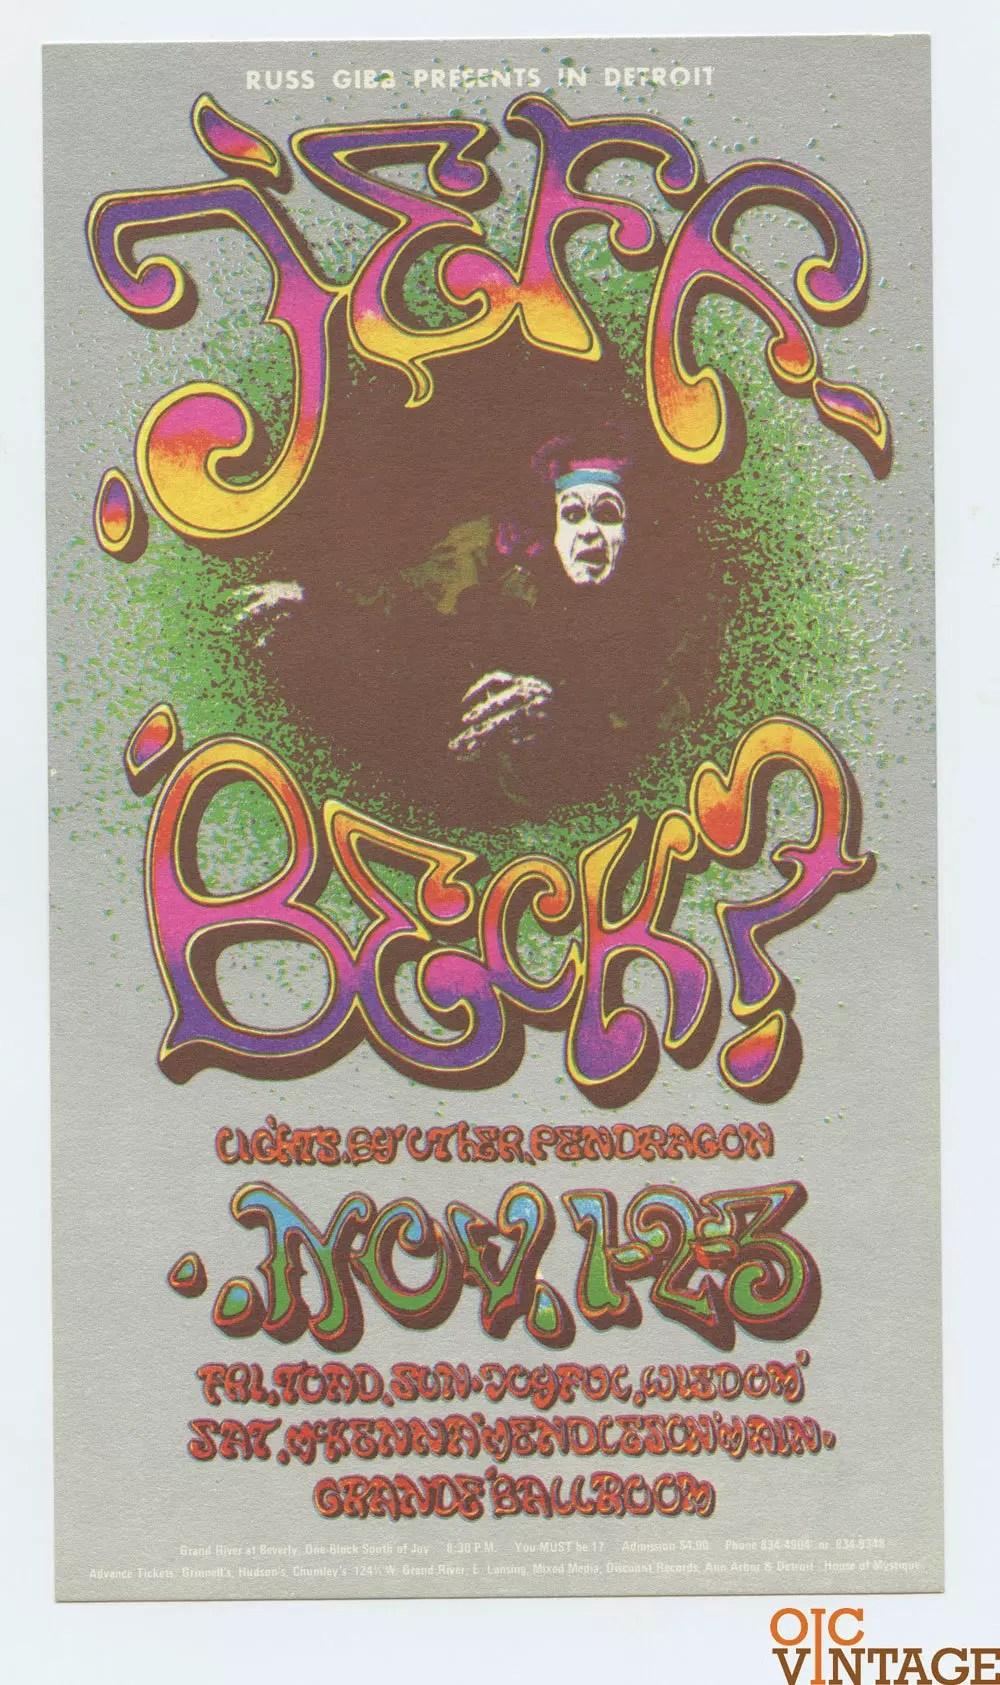 Grande Ballroom Postcard 1968 Nov 1 Jeff Beck McKenna Medenson AOR 3.155